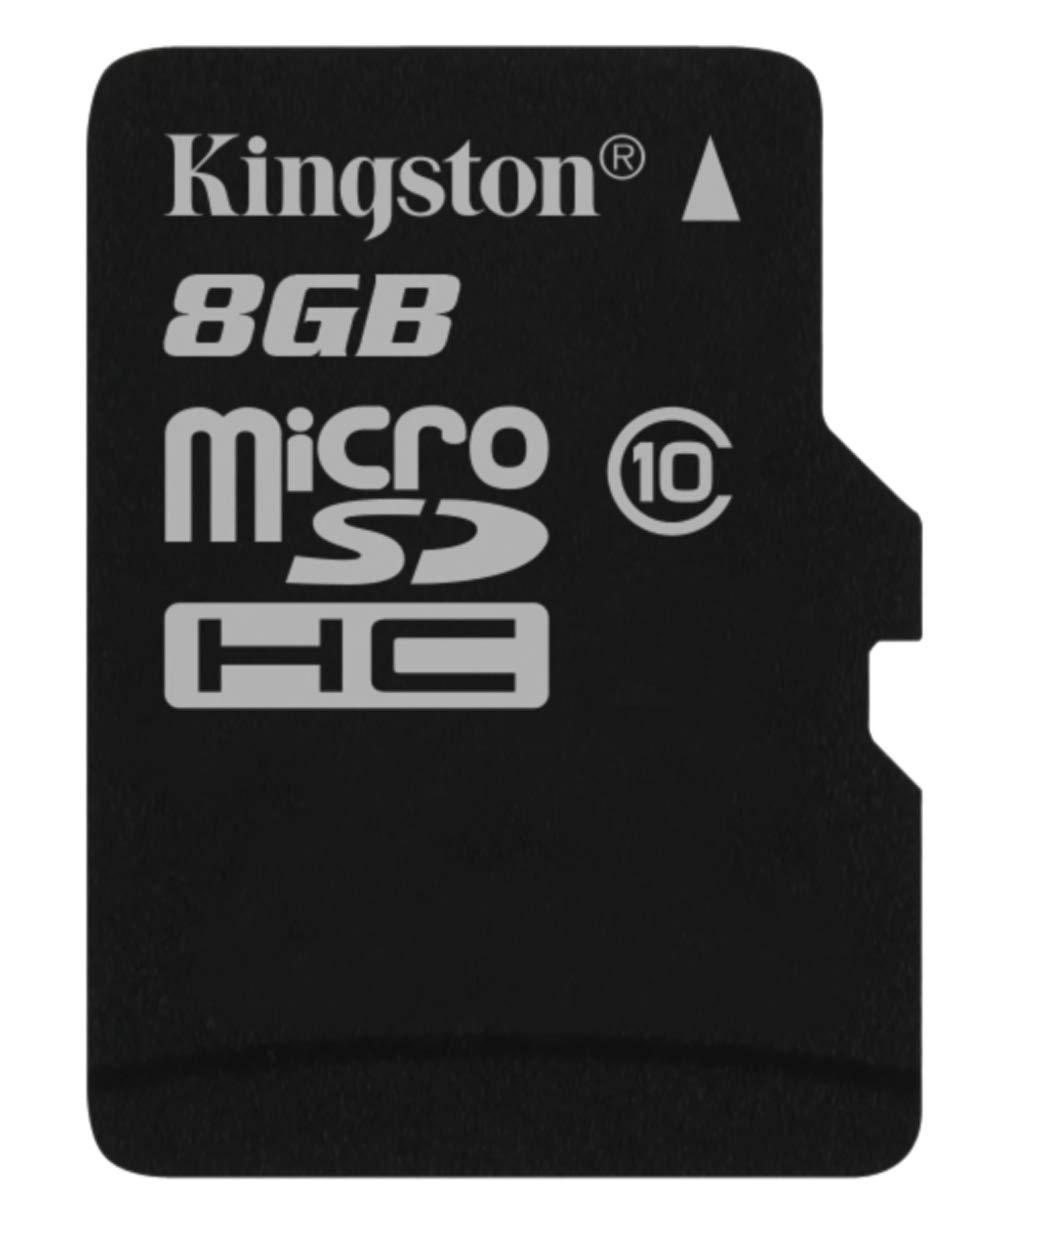 Kingston SDCX10/64GBSP - Tarjeta Micro SDXC de 64 GB, Clase 10 ...